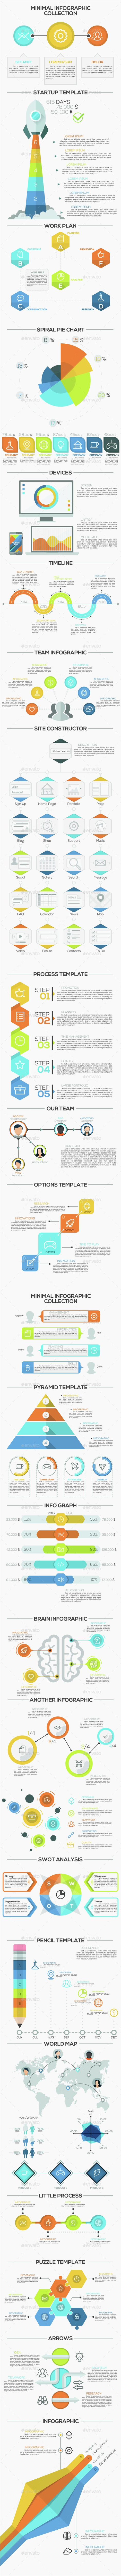 Minimal Infographic Pack - Infographics